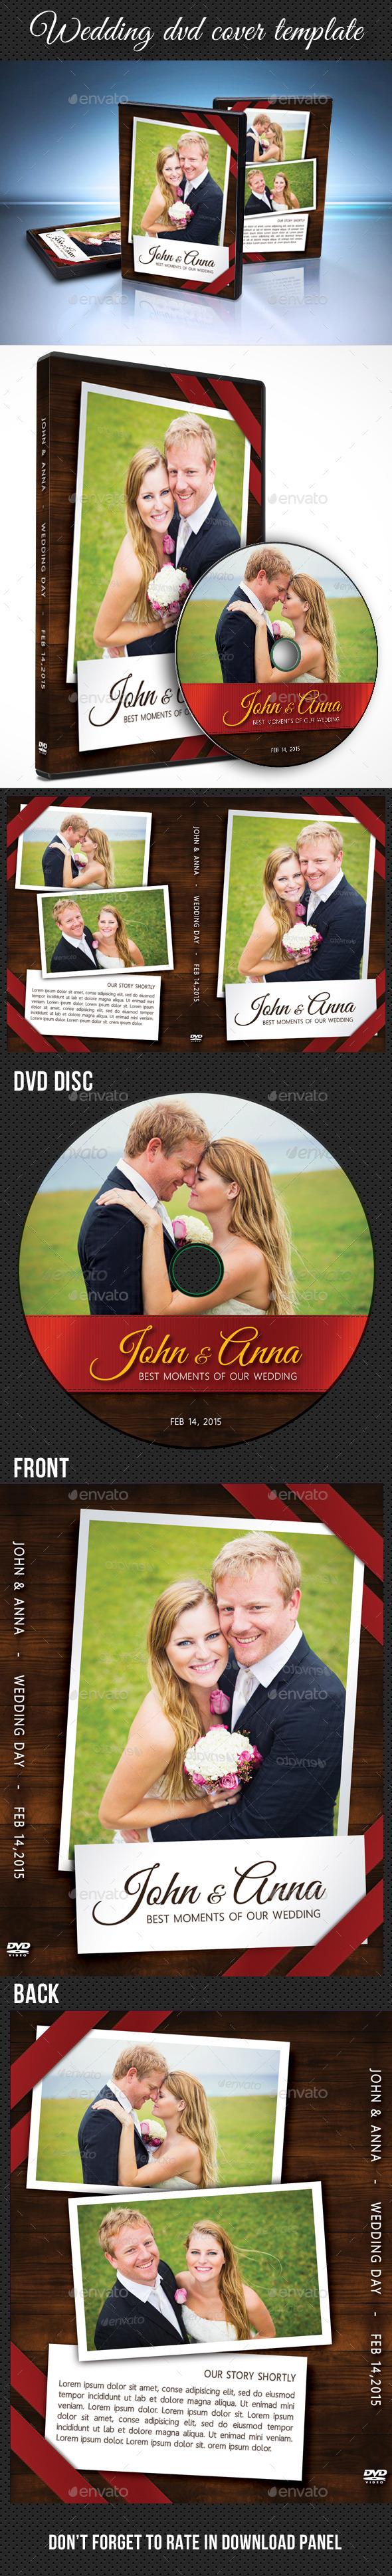 Wedding DVD Cover Template 10 - CD & DVD Artwork Print Templates